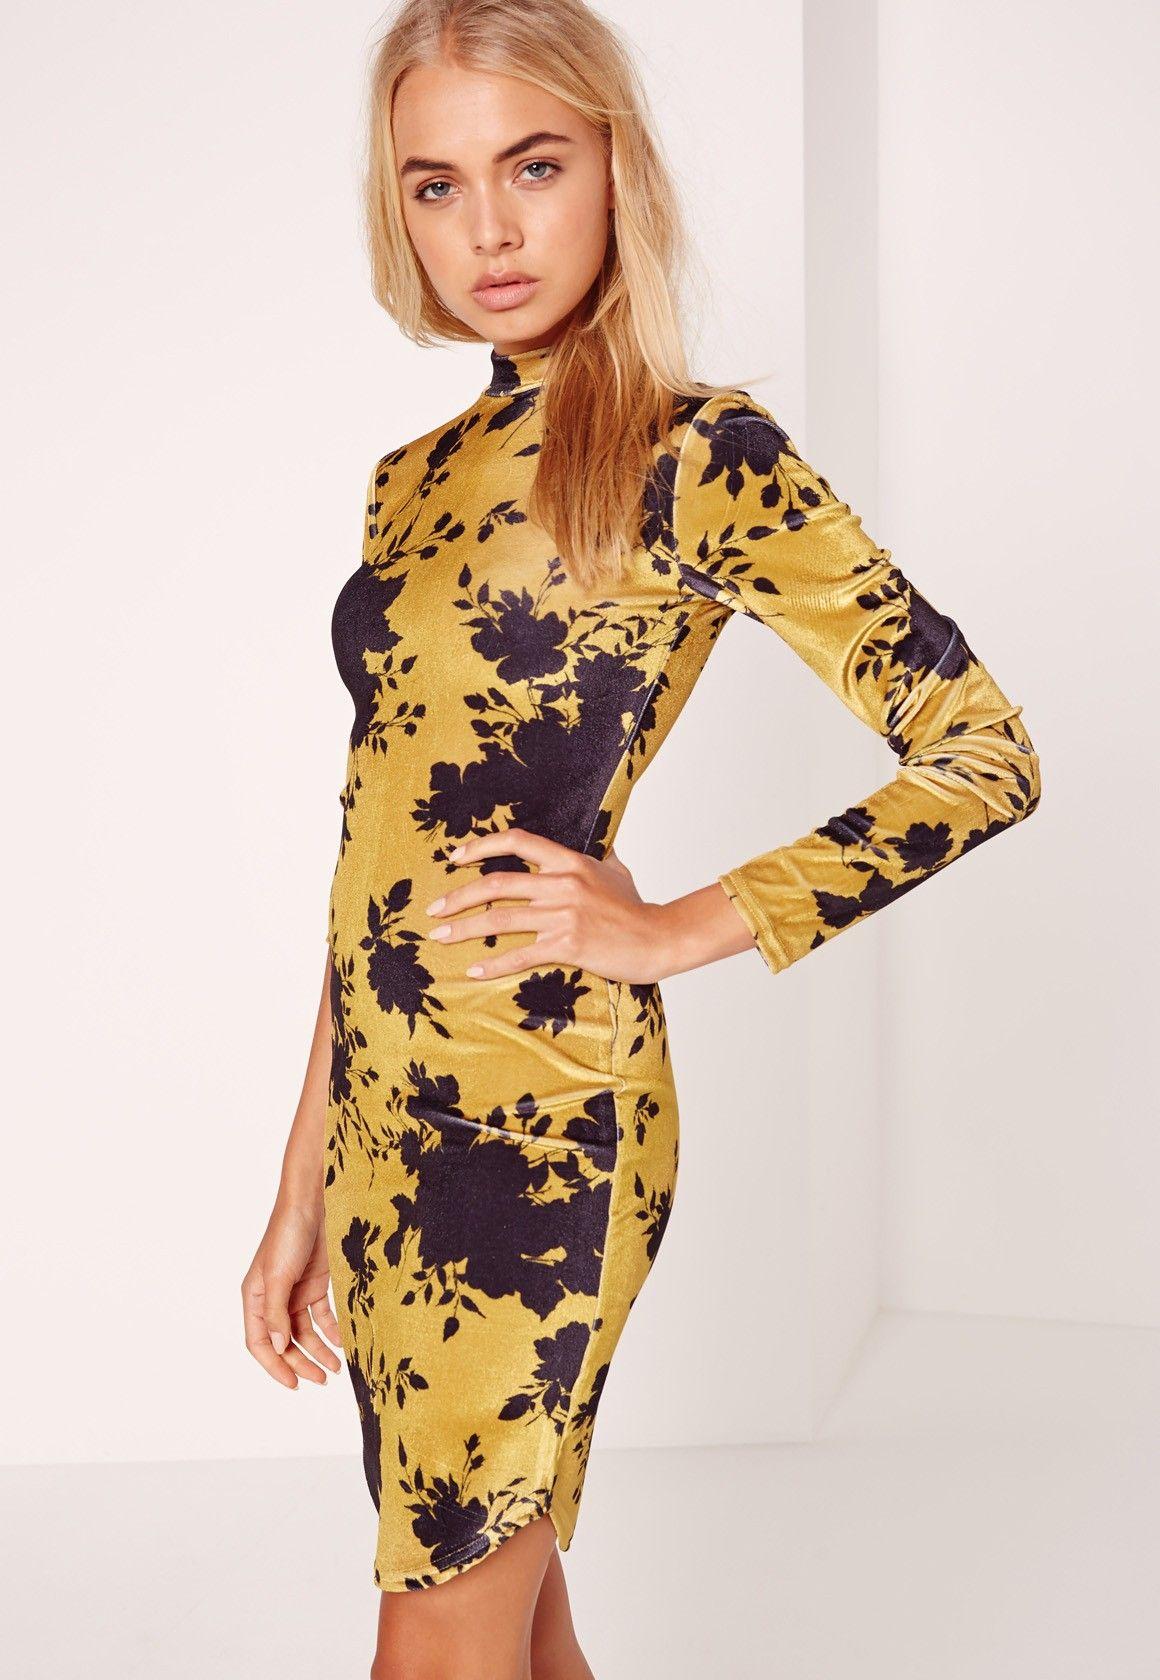 8f4fb693e87 Missguided - Long Sleeve Velvet Floral Bodycon Dress Yellow ...